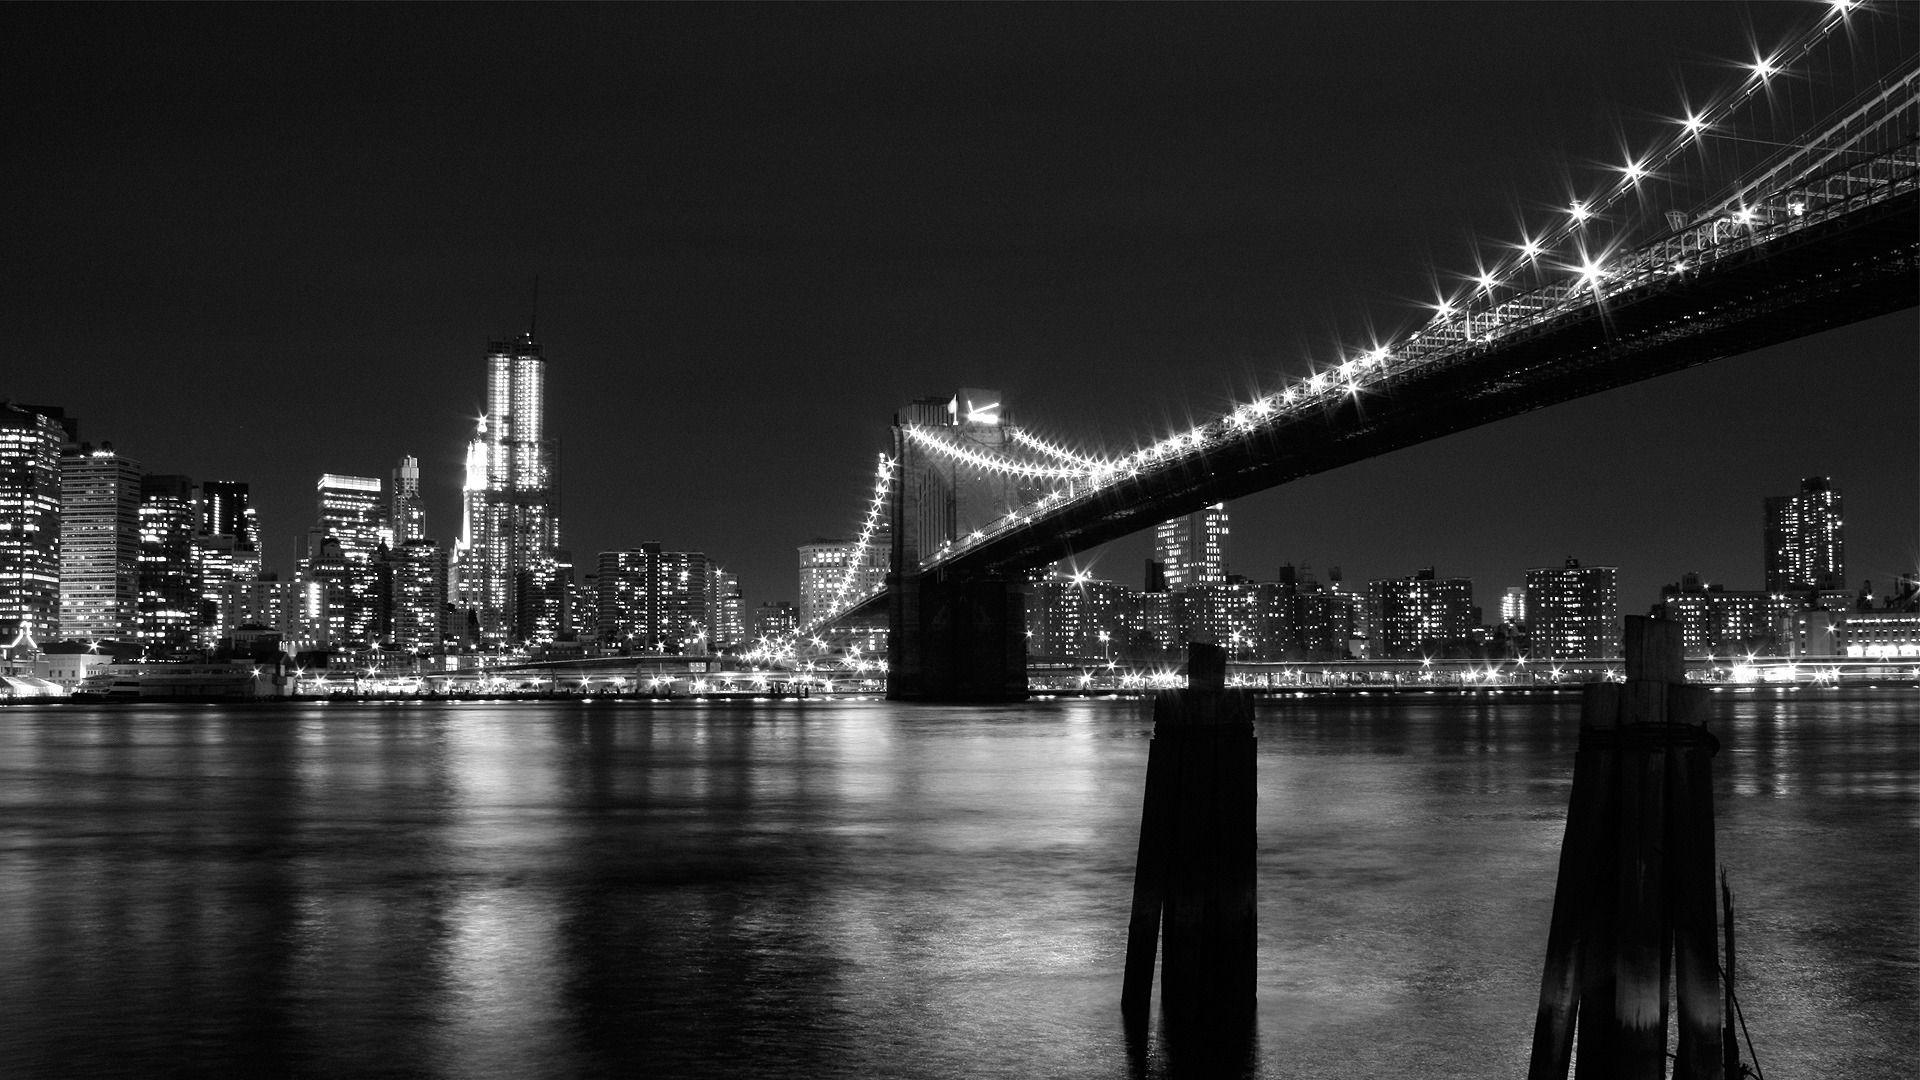 Bridge 1920x1080 City Wallpaper New York Tourist Attractions New York Pictures